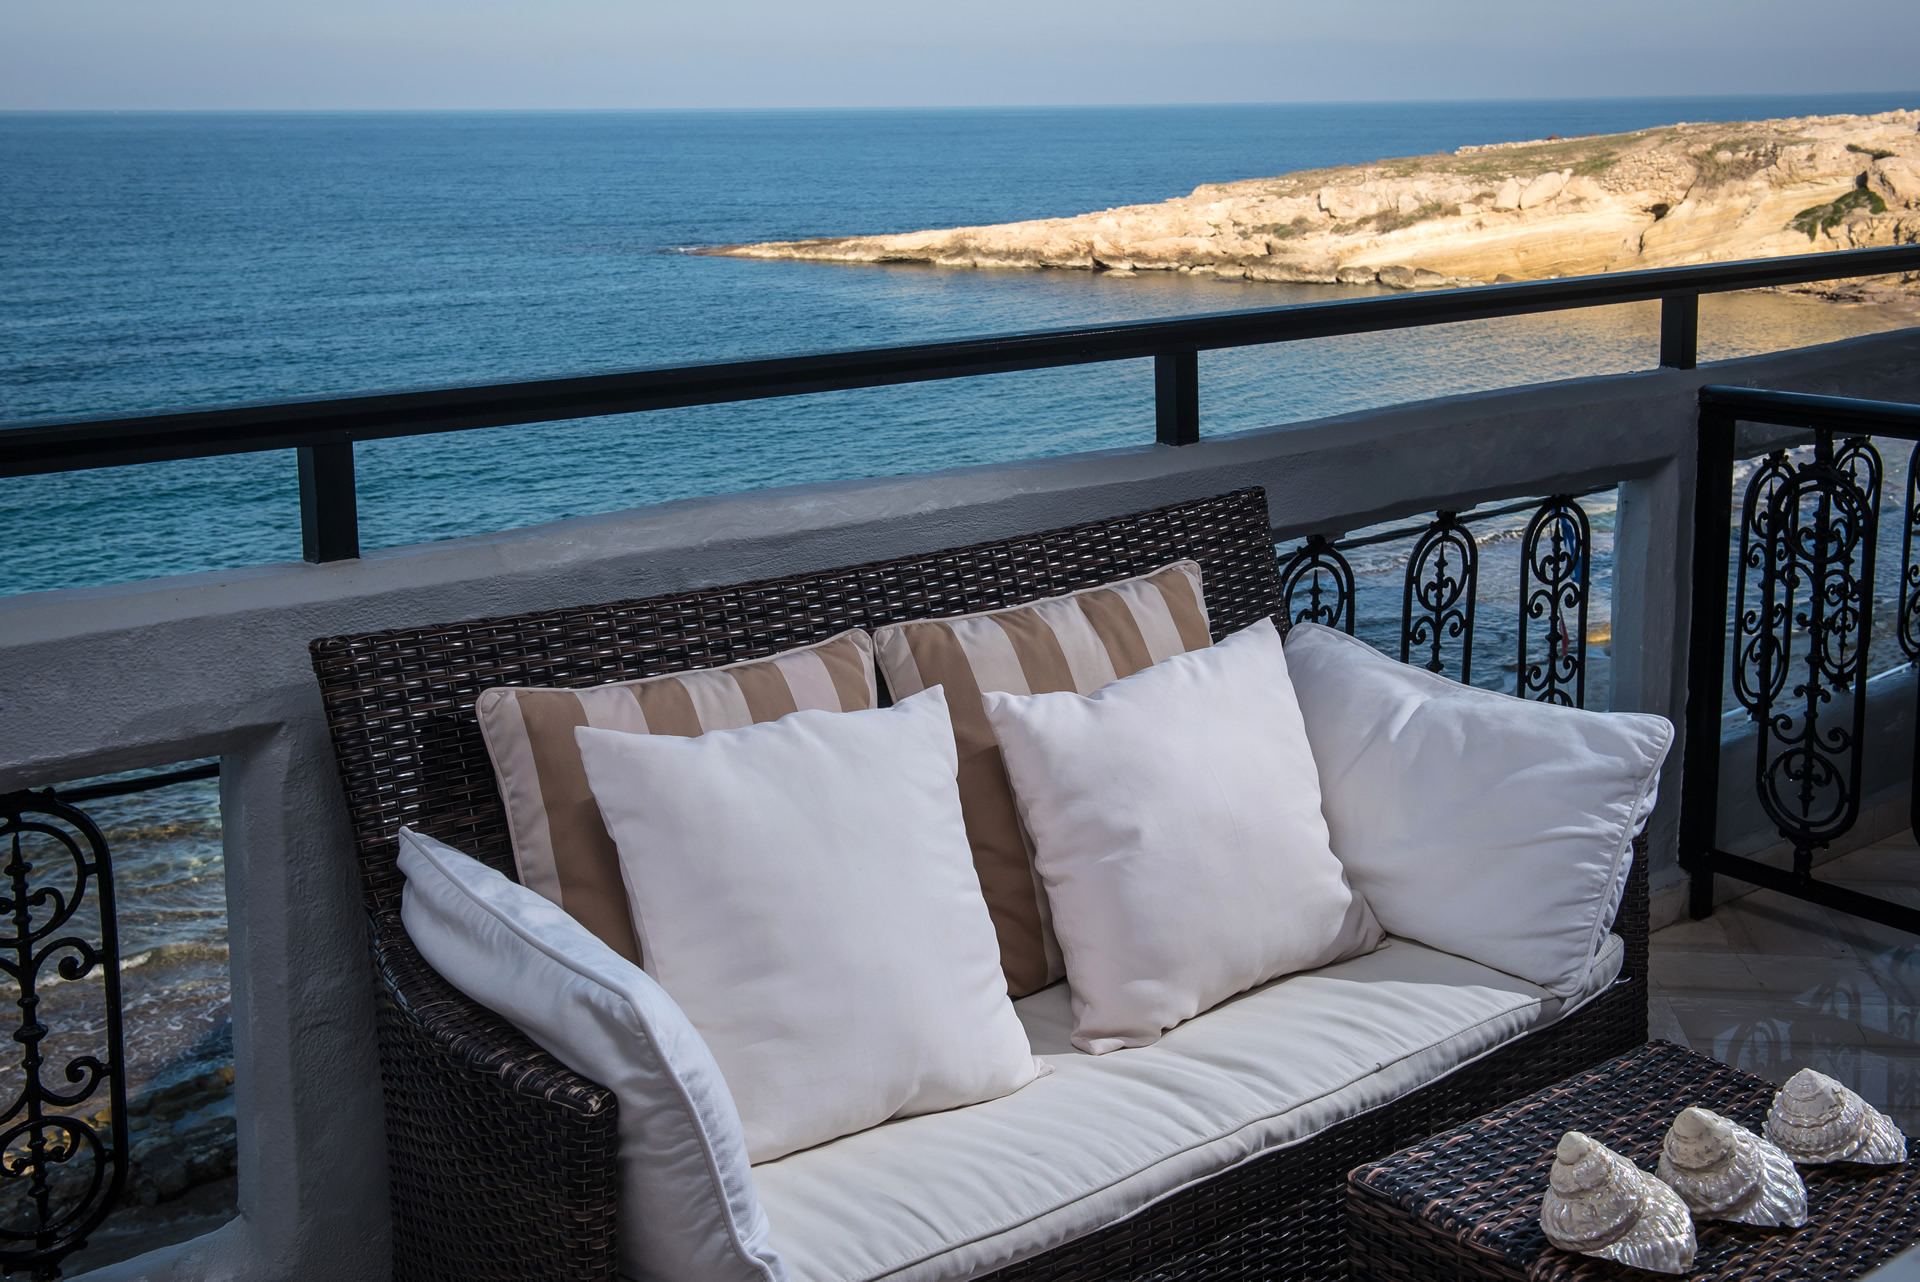 Apartments Hersonissos Villa Sonia - STARTSEITE